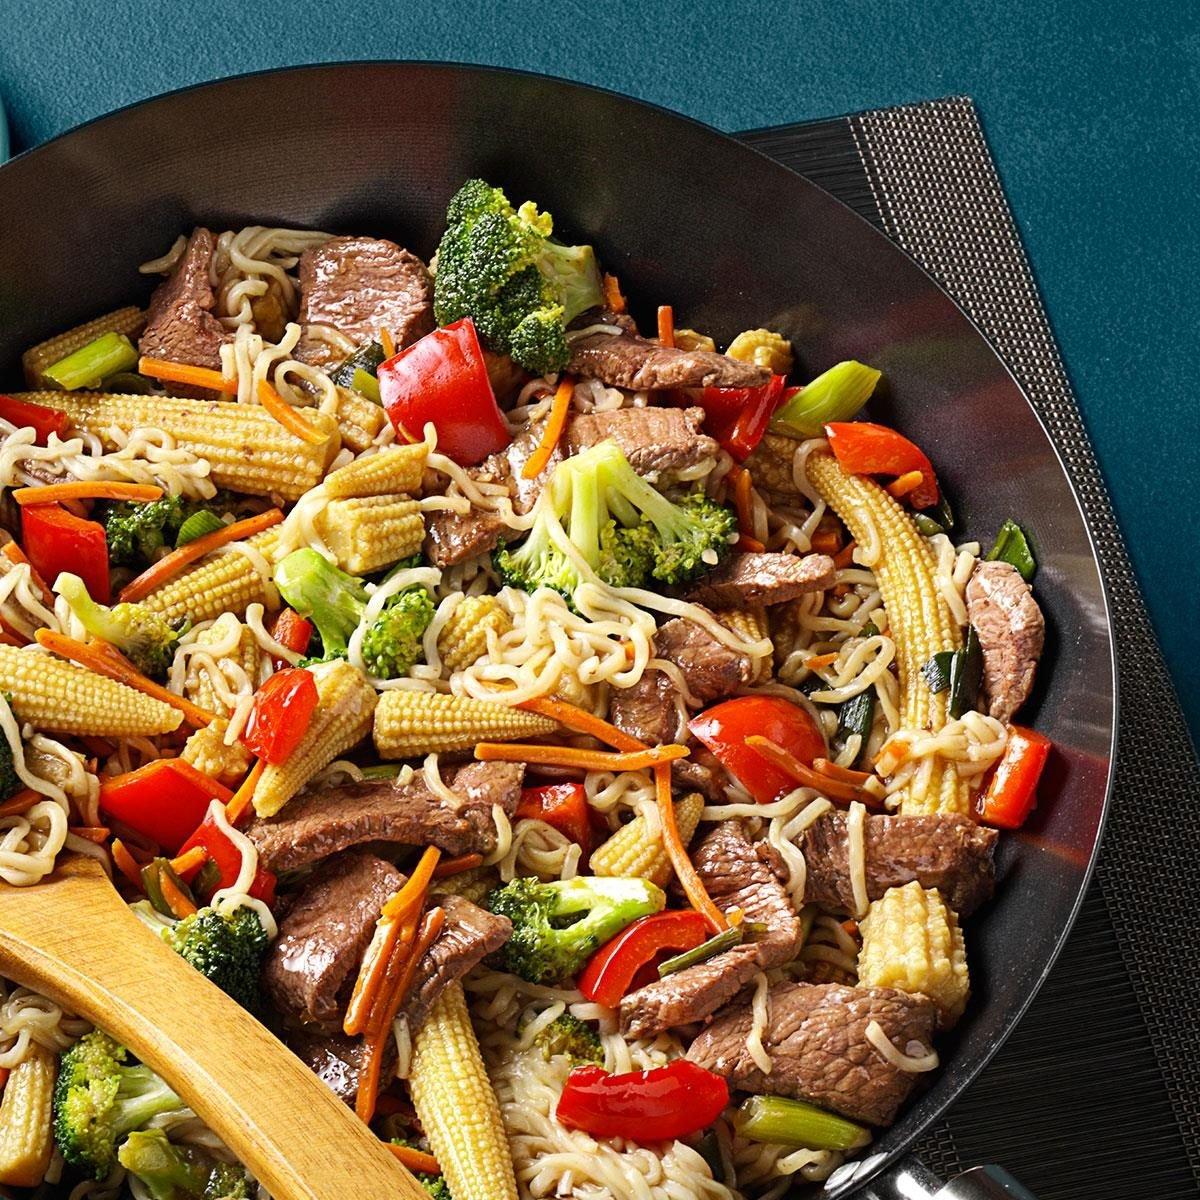 Red Cabbage And Fried Mortadella Okonomiyaki Recipes: Sirloin Stir-Fry With Ramen Noodles Recipe